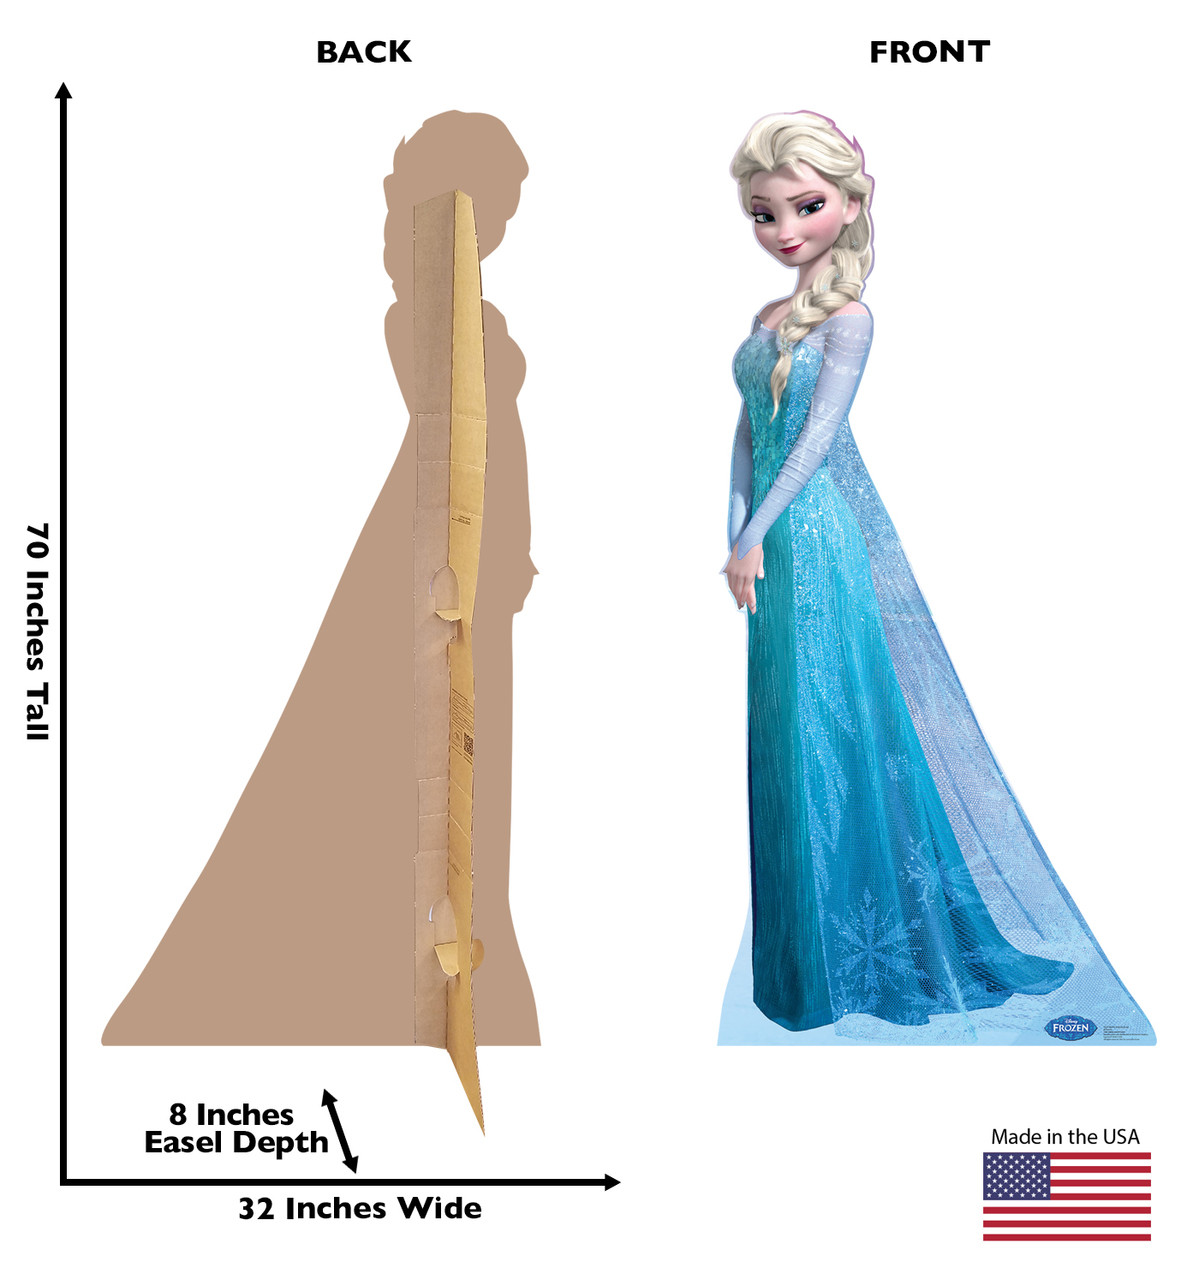 Life-size Snow Queen Elsa - Disney's Frozen Cardboard Standup |Cardboard Cutout